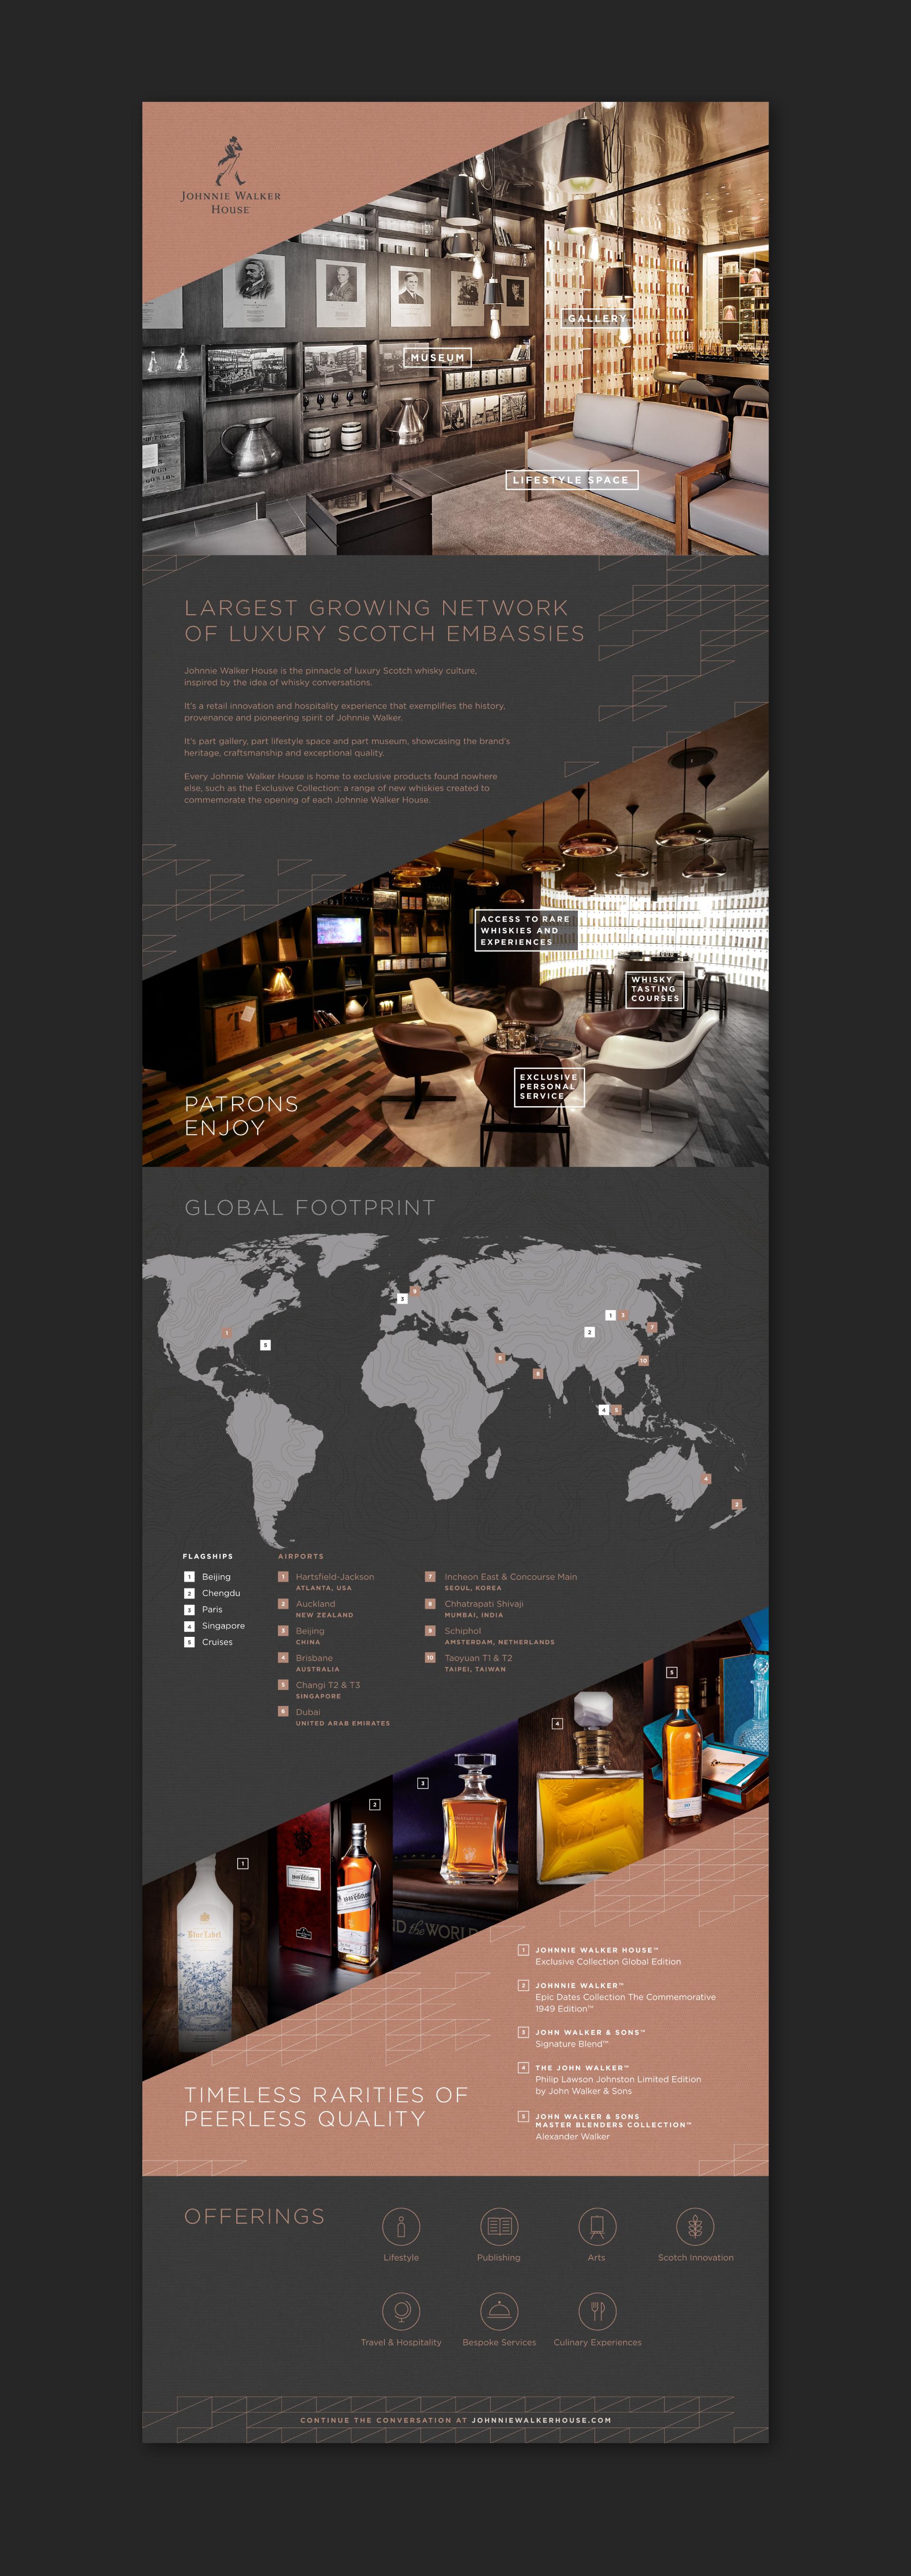 Case-Study-Infographic-JWH.jpg